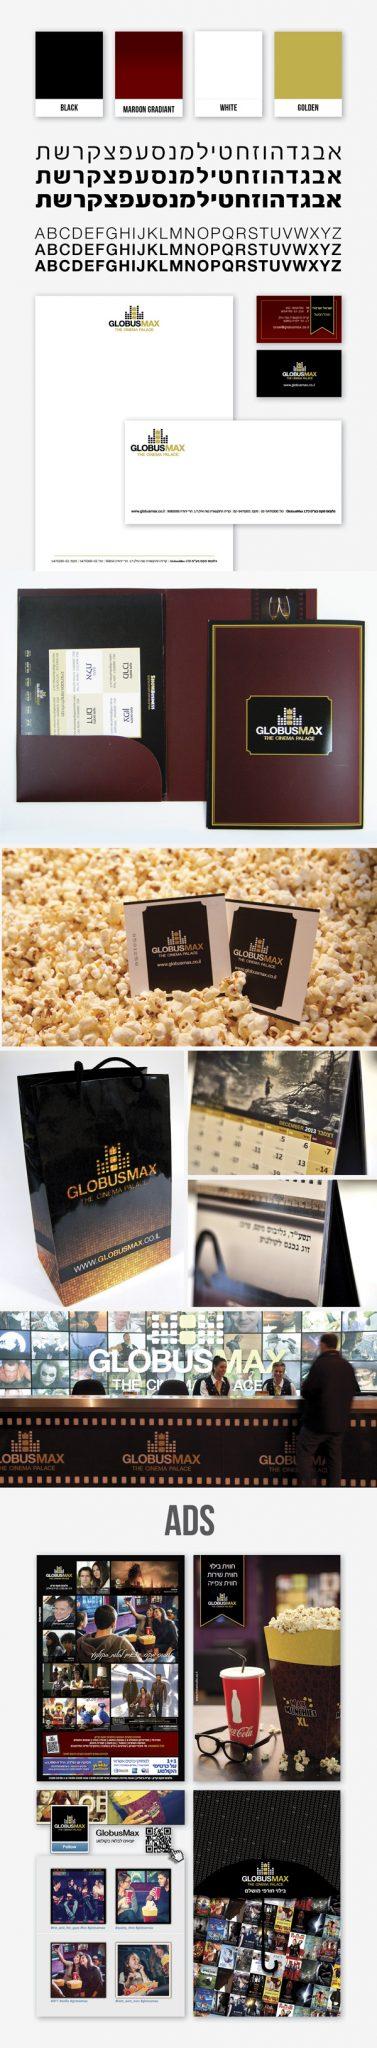 cinema branding, logo, print, ads, popcorn